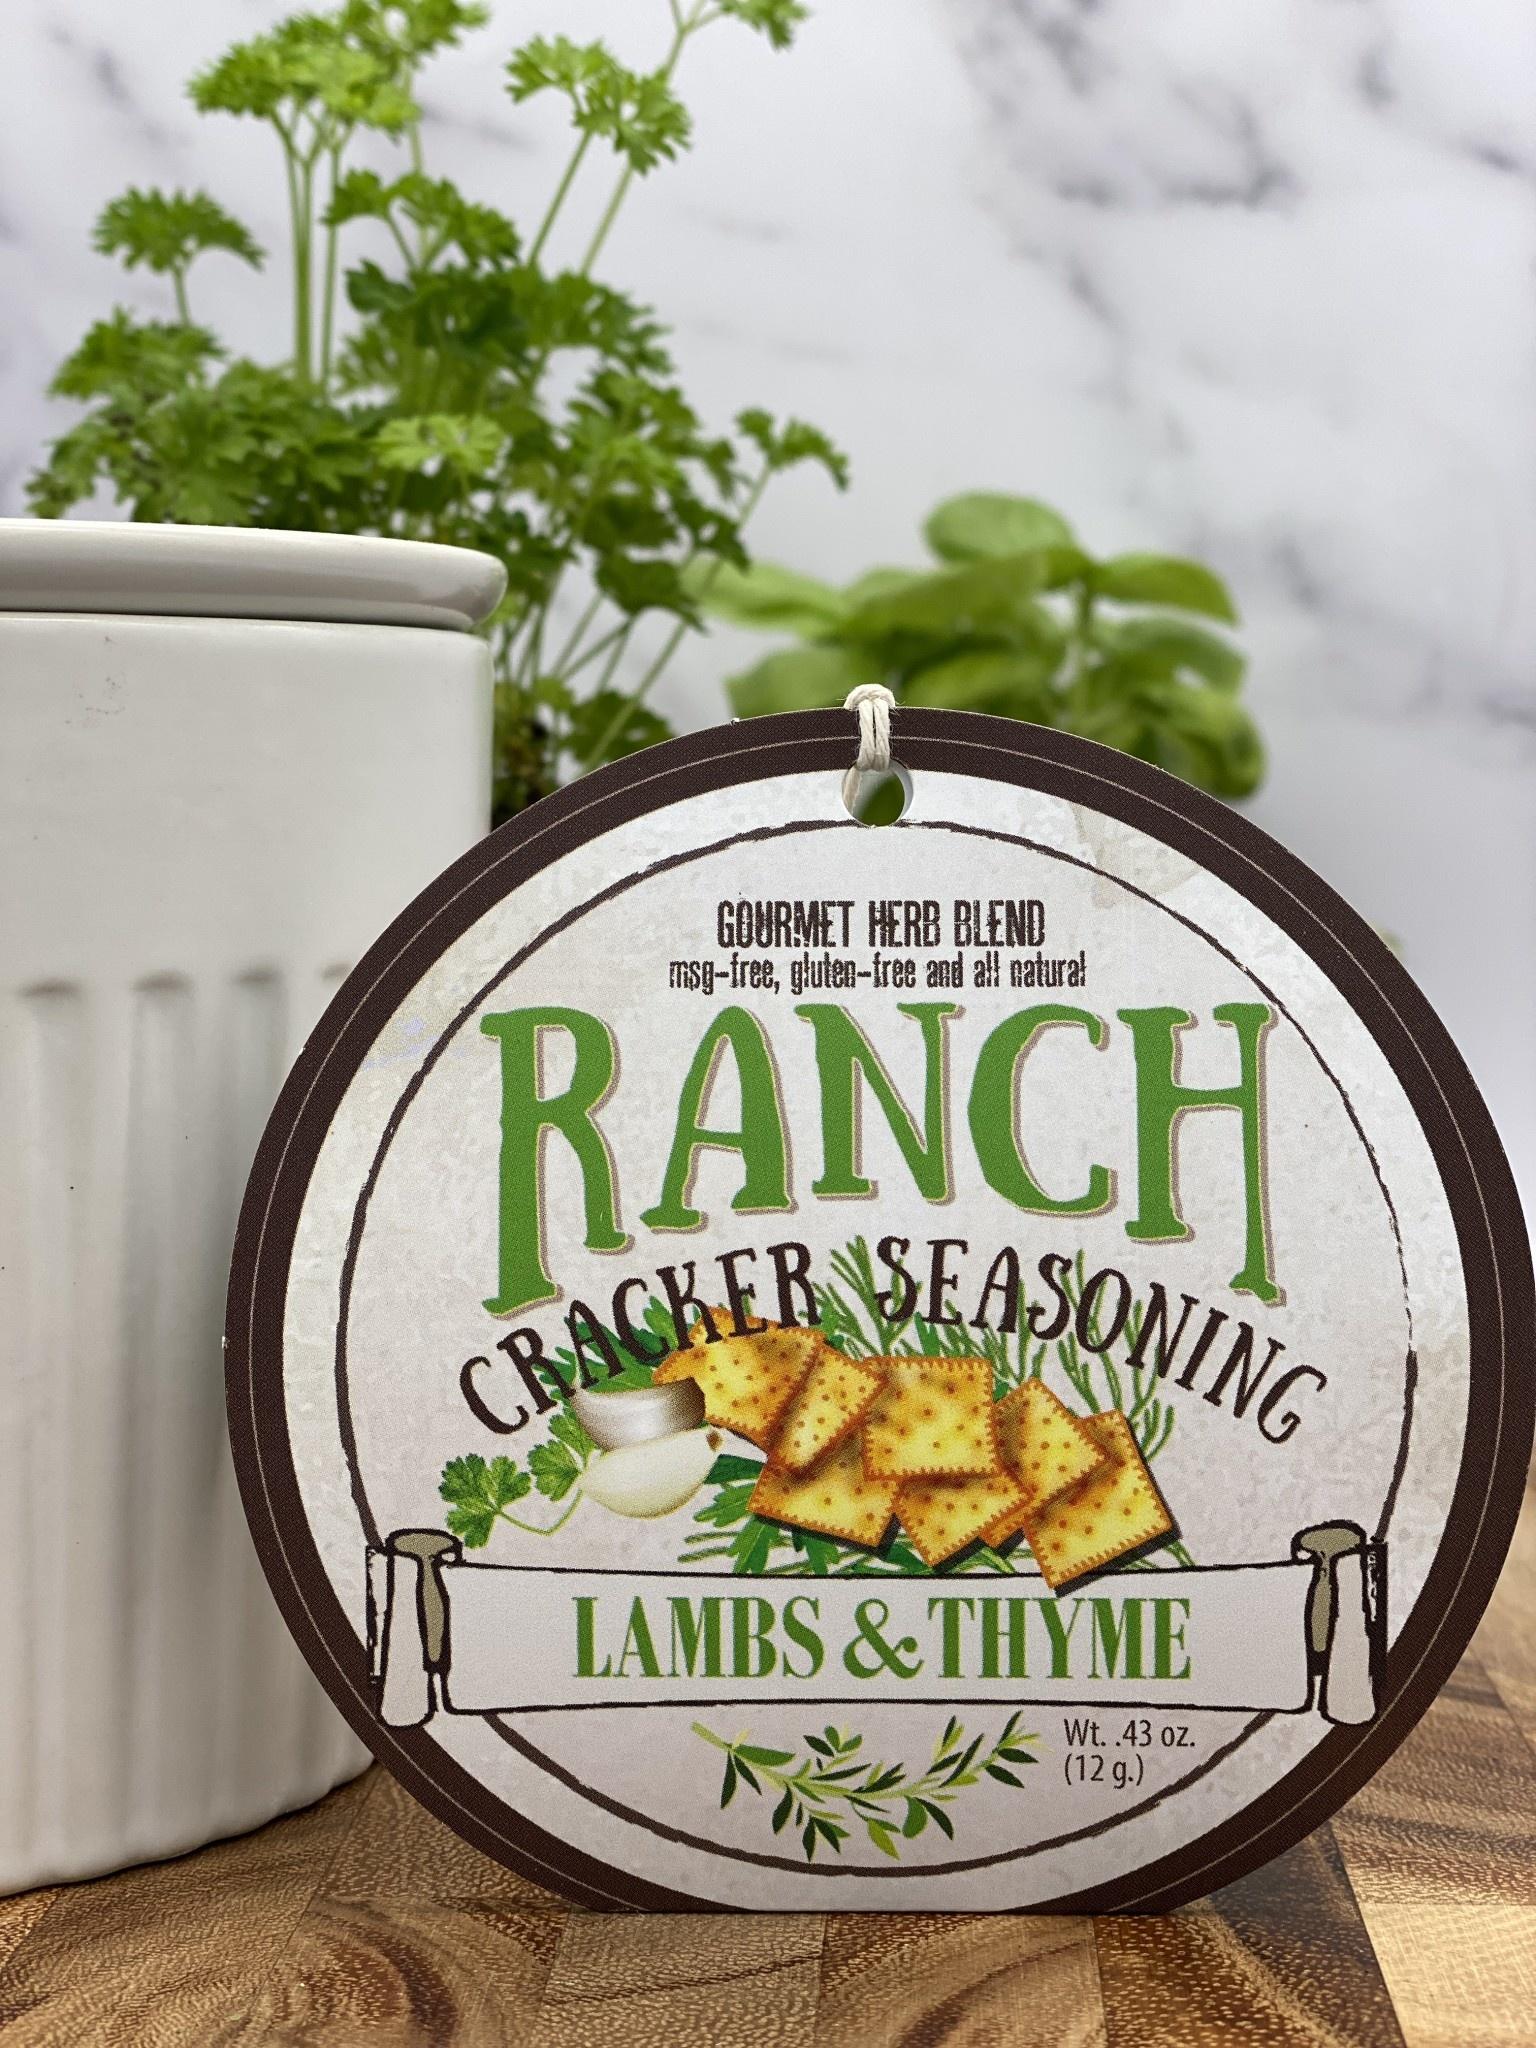 Lambs & Thyme Ranch Cracker Seasoning